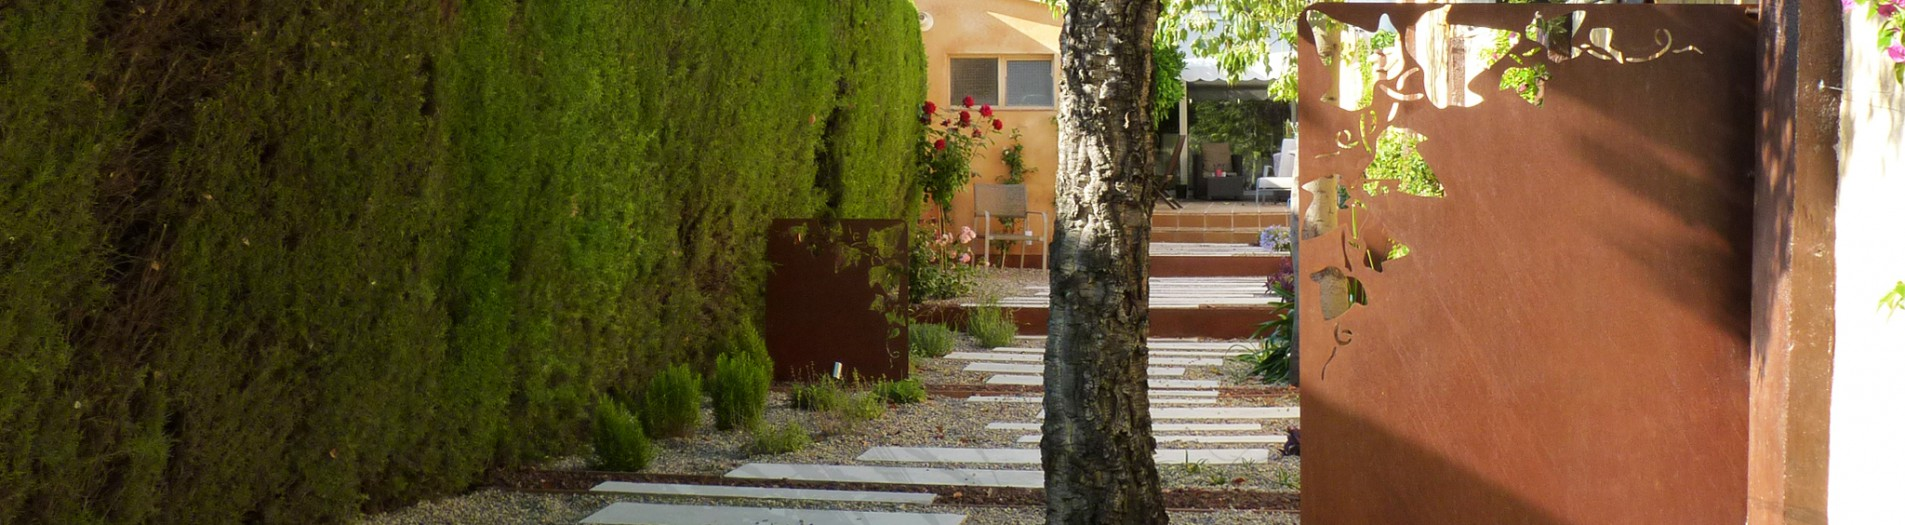 Jardín en Olesa de Montserrat